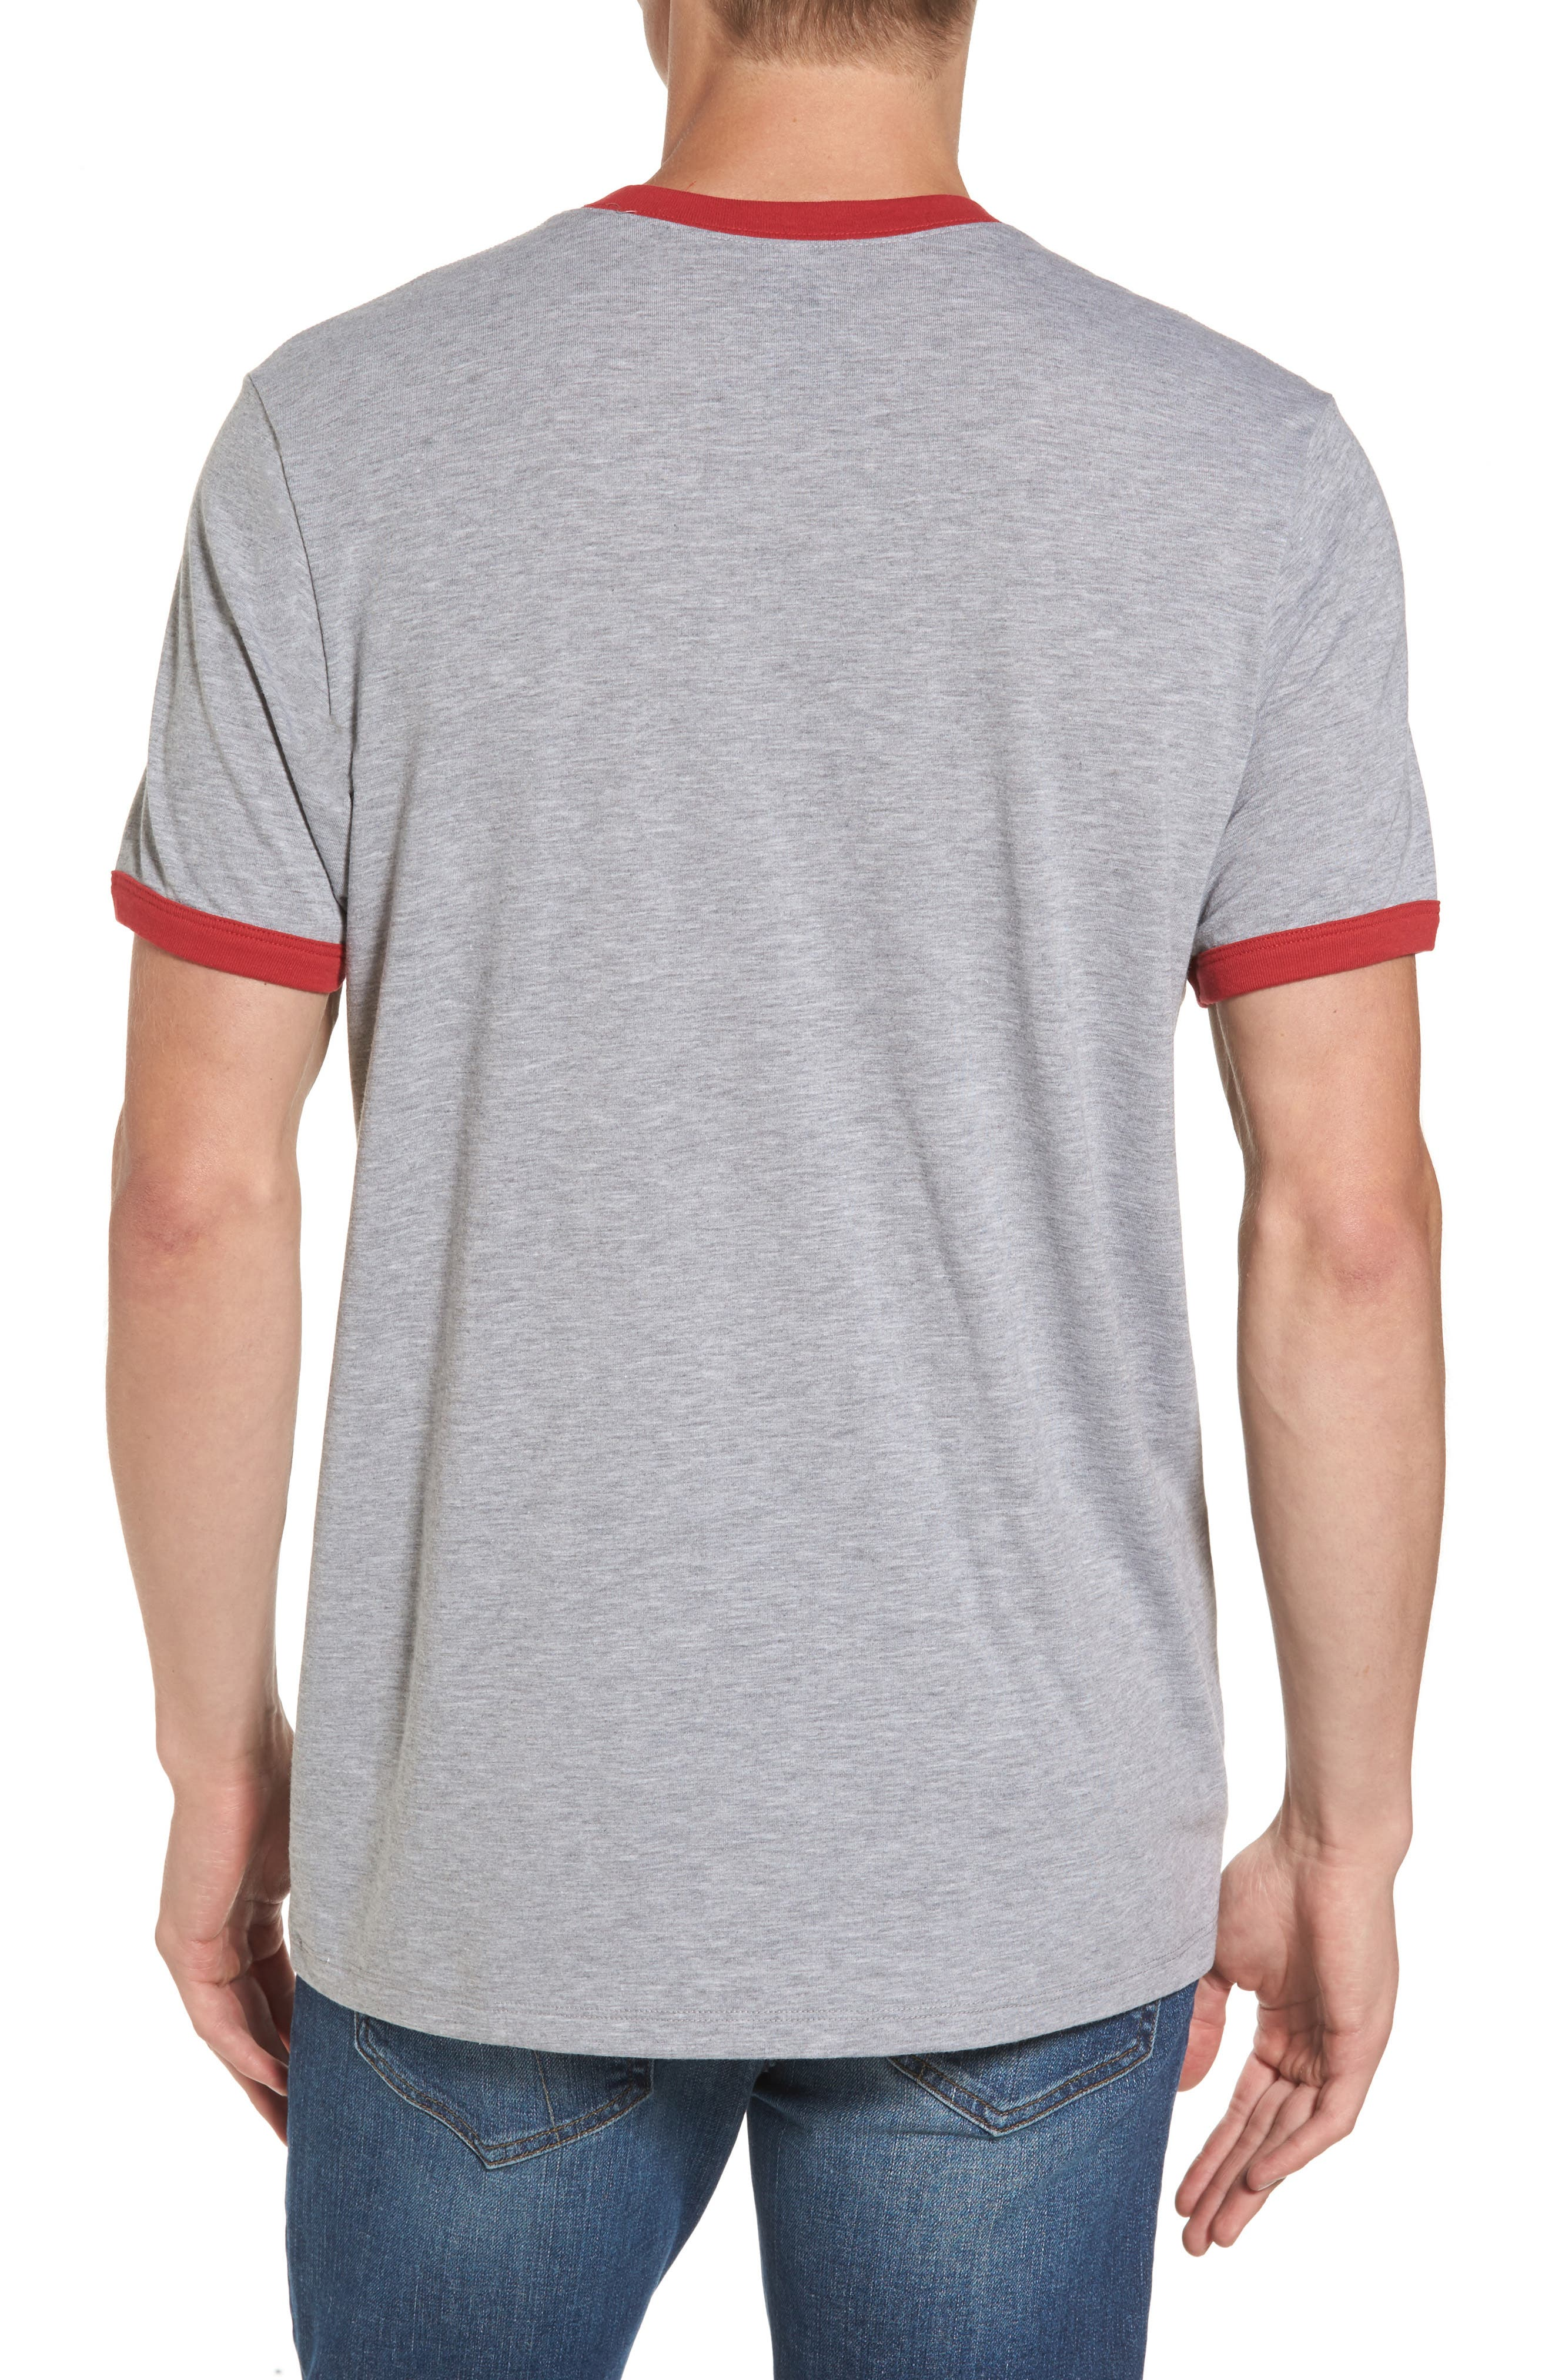 Kansas City Chiefs Ringer T-Shirt,                             Alternate thumbnail 2, color,                             Grey